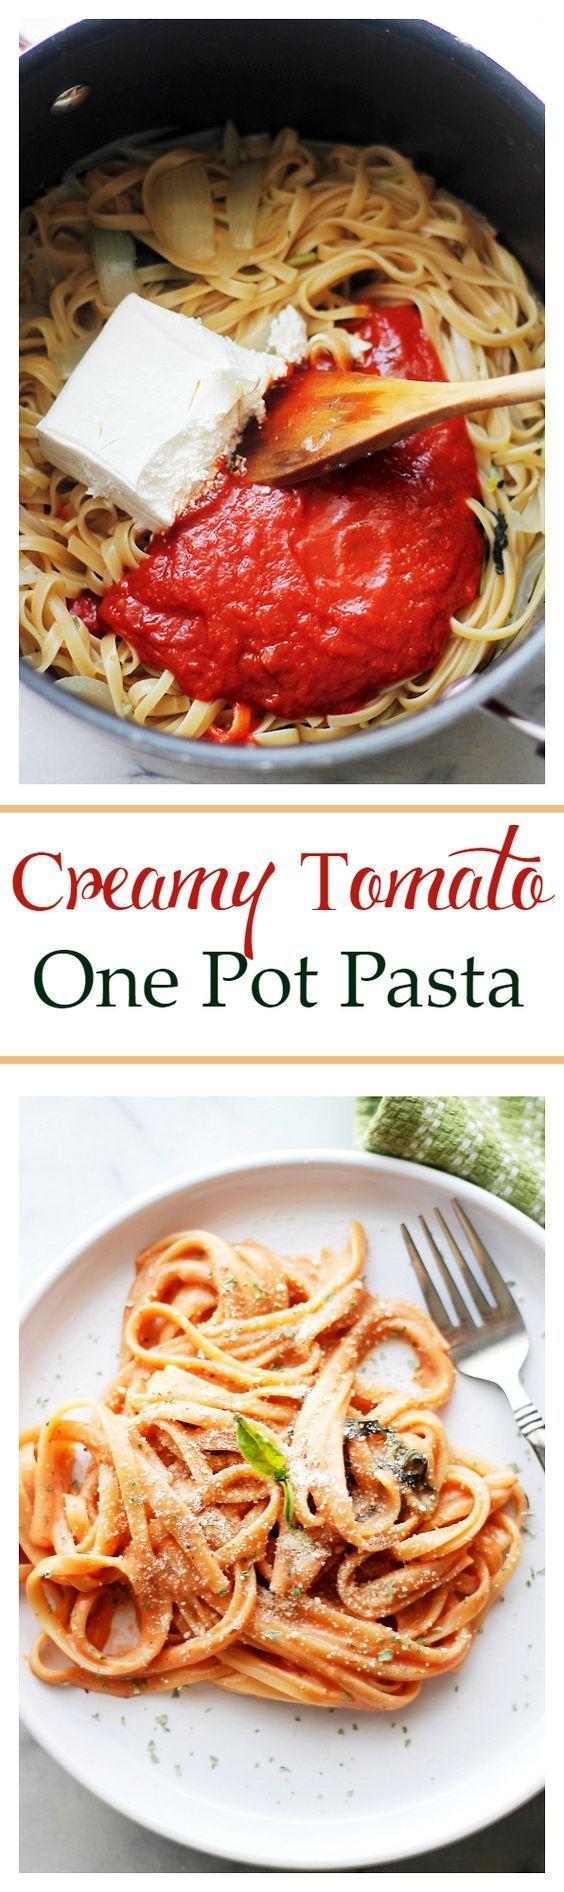 Creamy Tomato One Pot Pasta Recipe - only 25 minutes to make! | Diethood